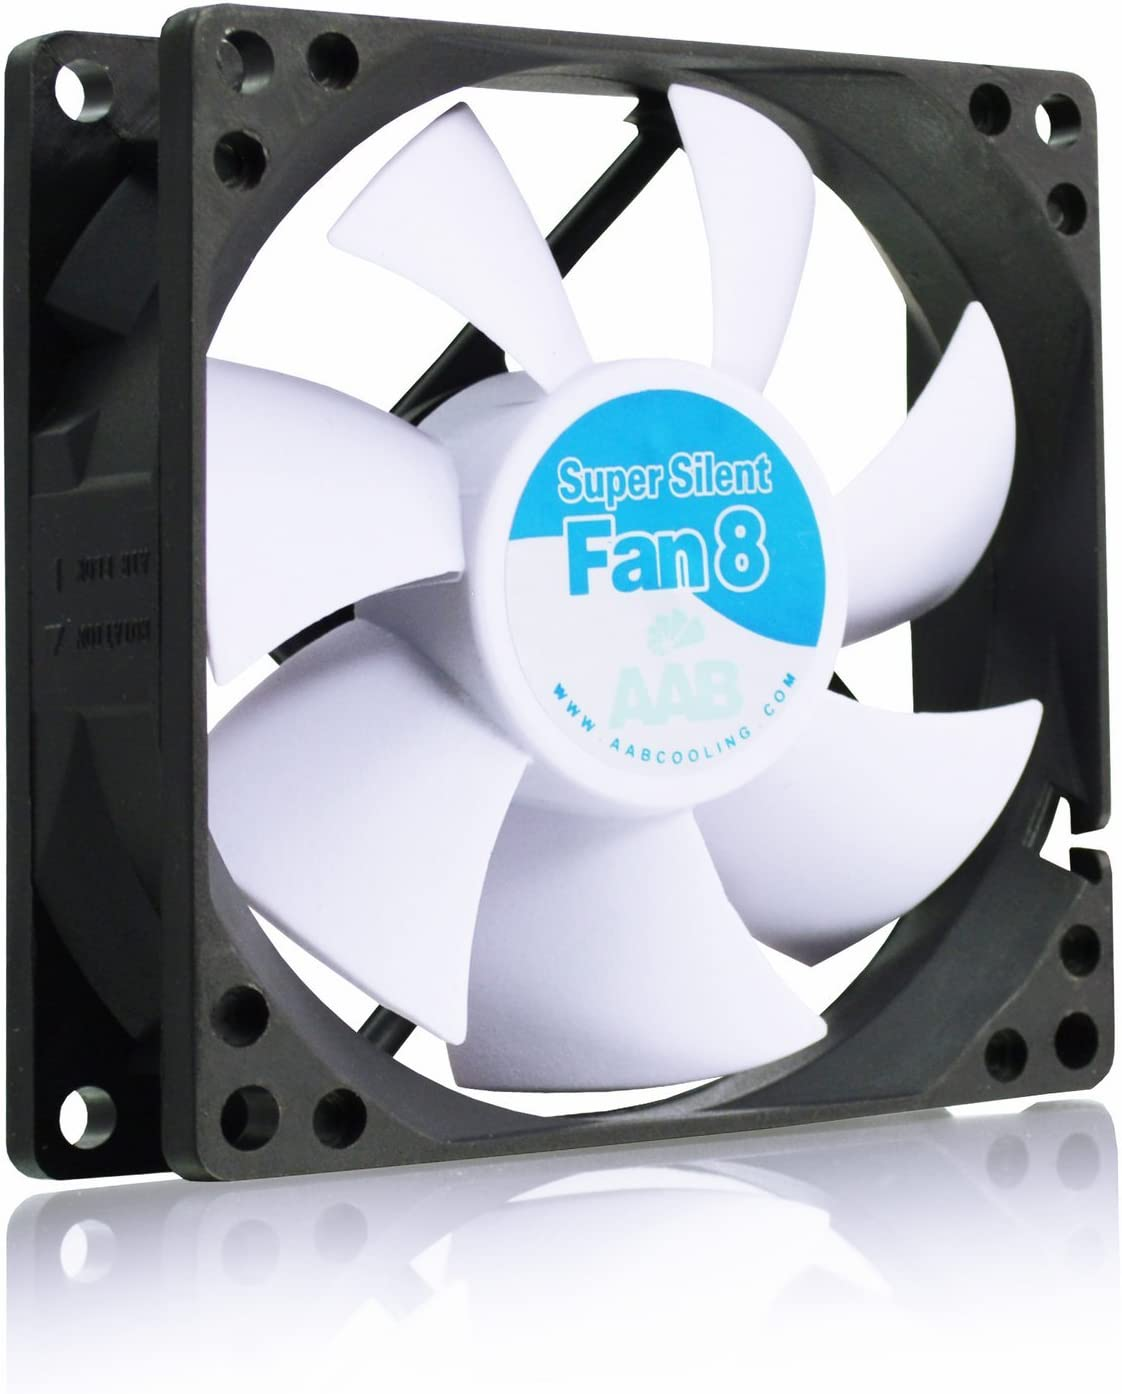 AAB Cooling Super Silent Fan 8 - Un Silencioso y Muy Efectivo Ventilador 80mm, Ventilador Laptop, Fan Cooler 8cm, Fan PC, 33m3/h, 1600 RPM